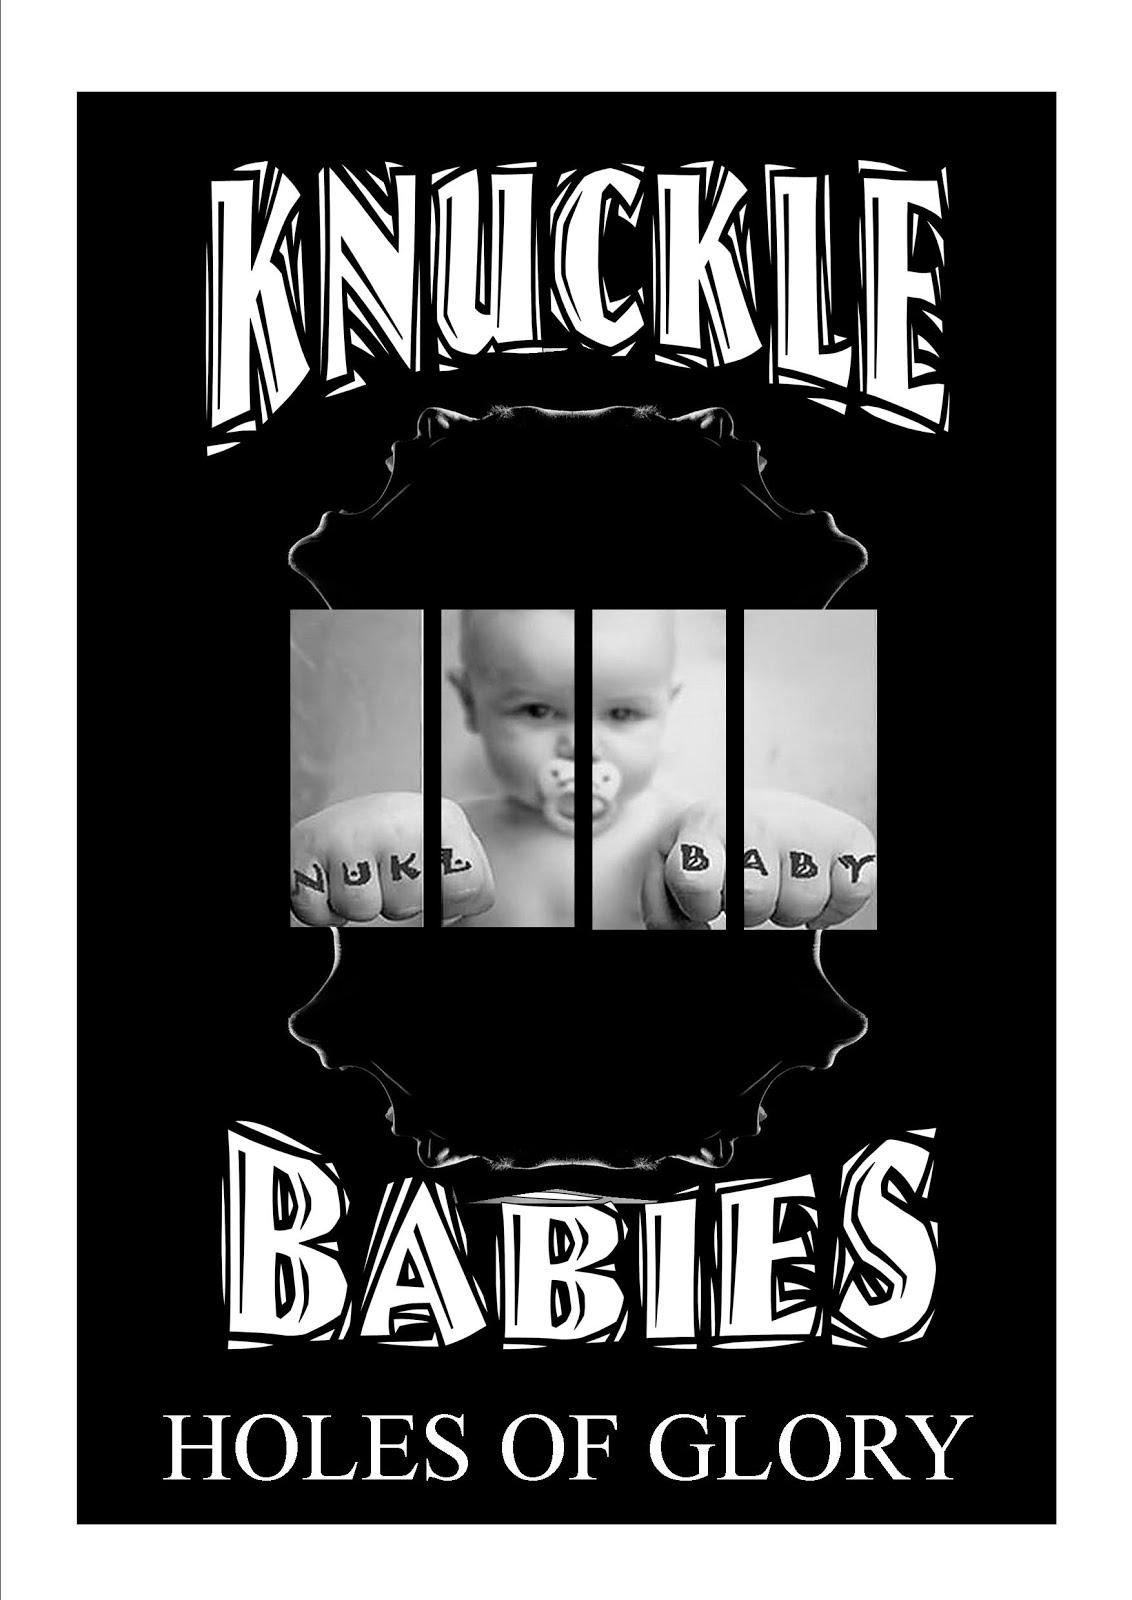 Knuckle Babies